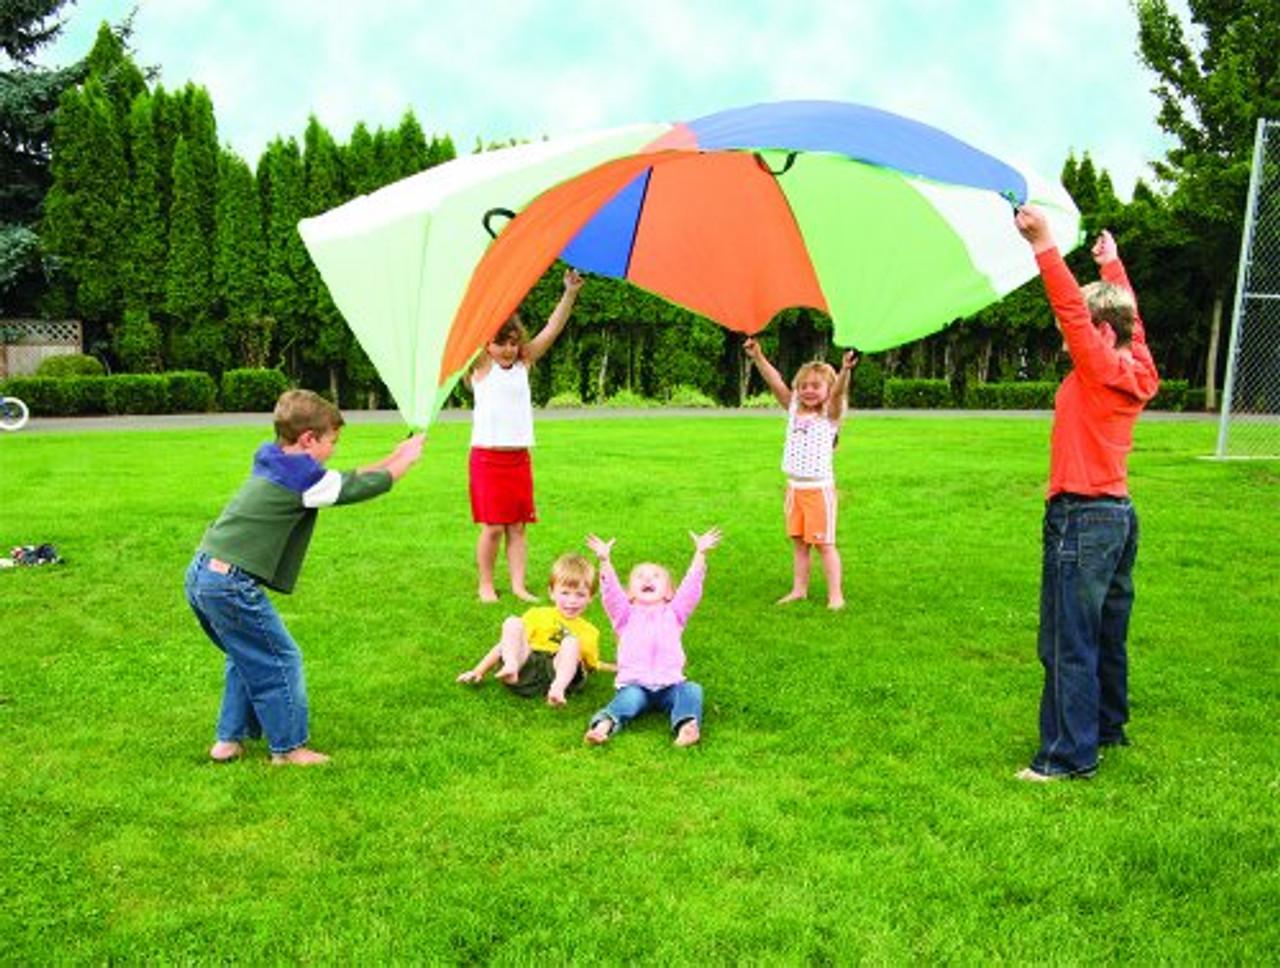 10 Foot Jumbo Parachute